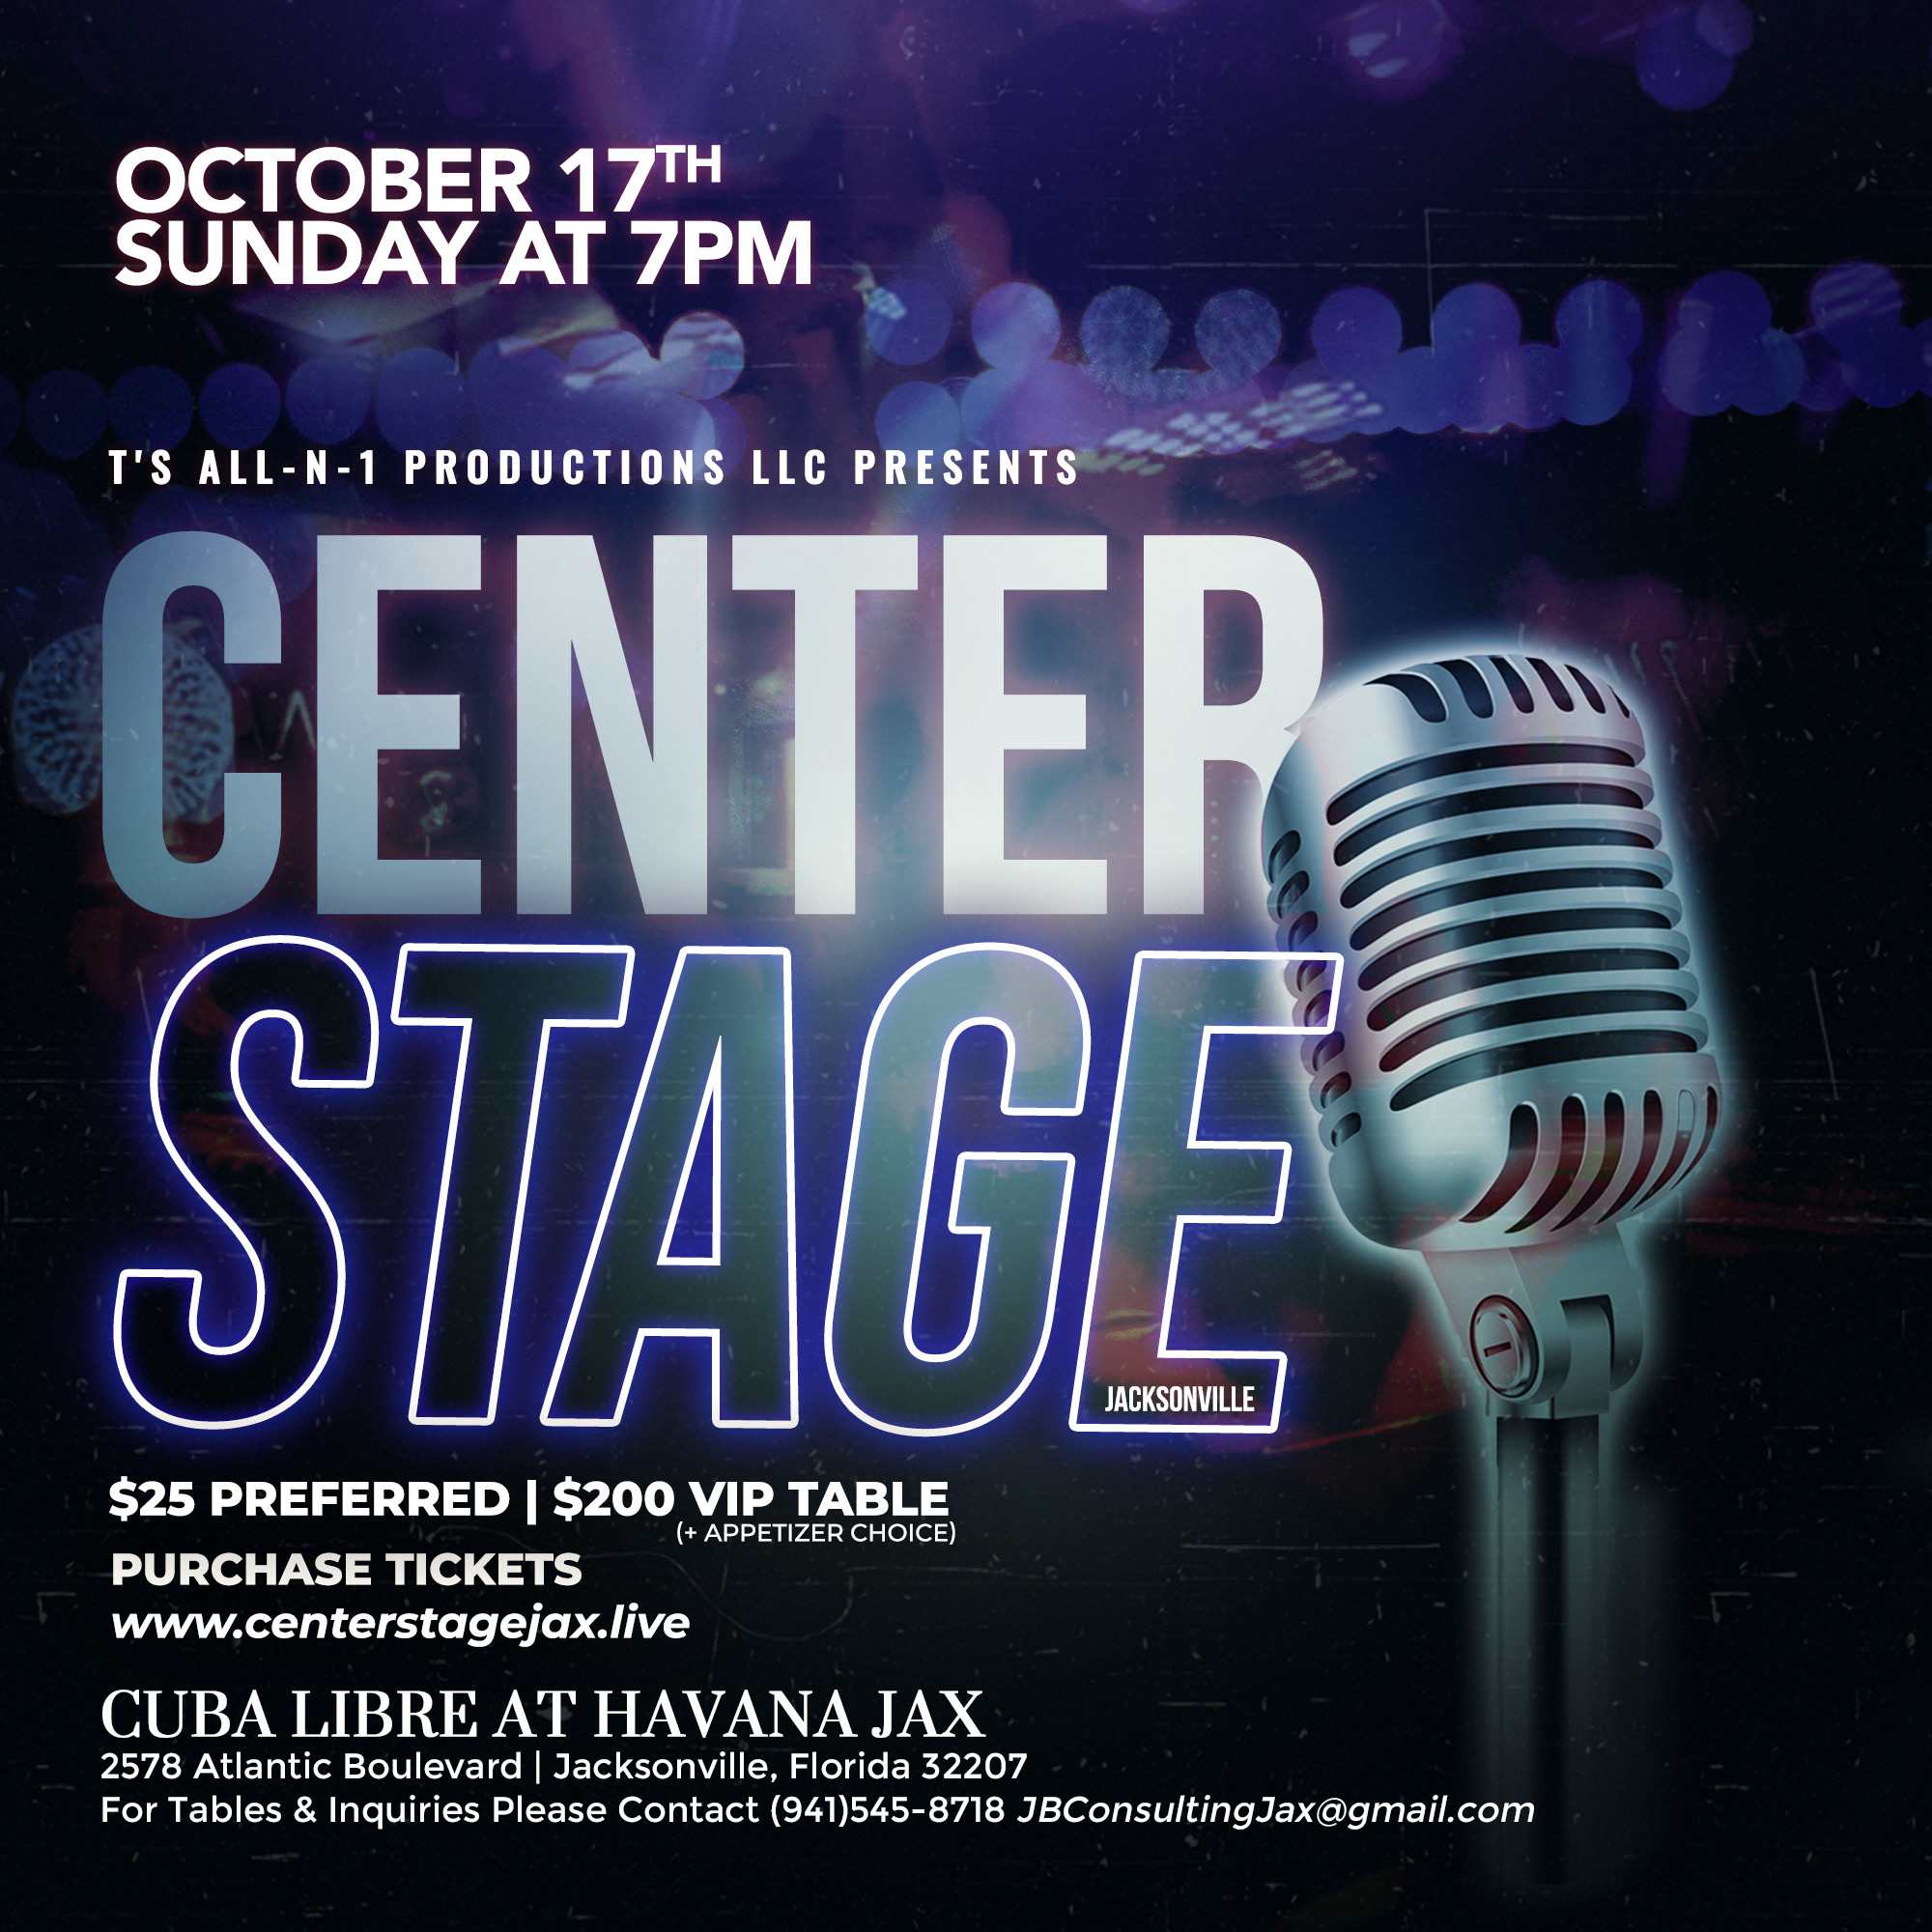 Center Stage Jacksonville at Cuba Libre Havana